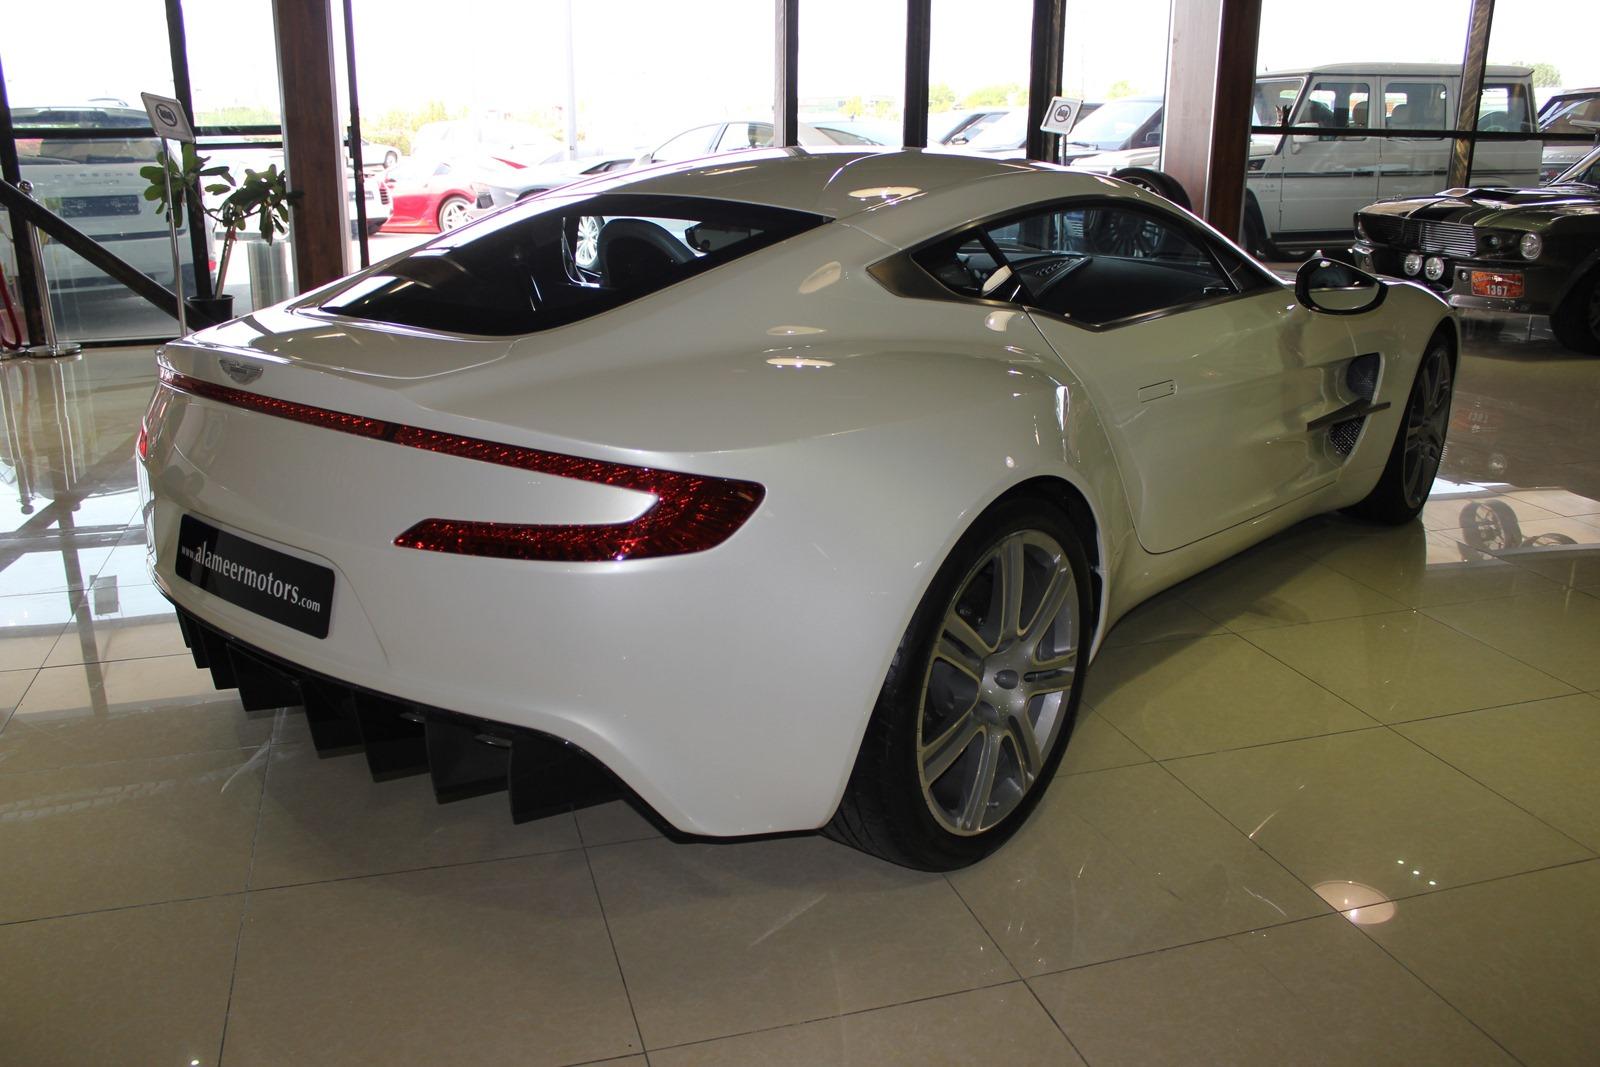 Aston-Martin-One-77-5%25255B3%25255D.jpg